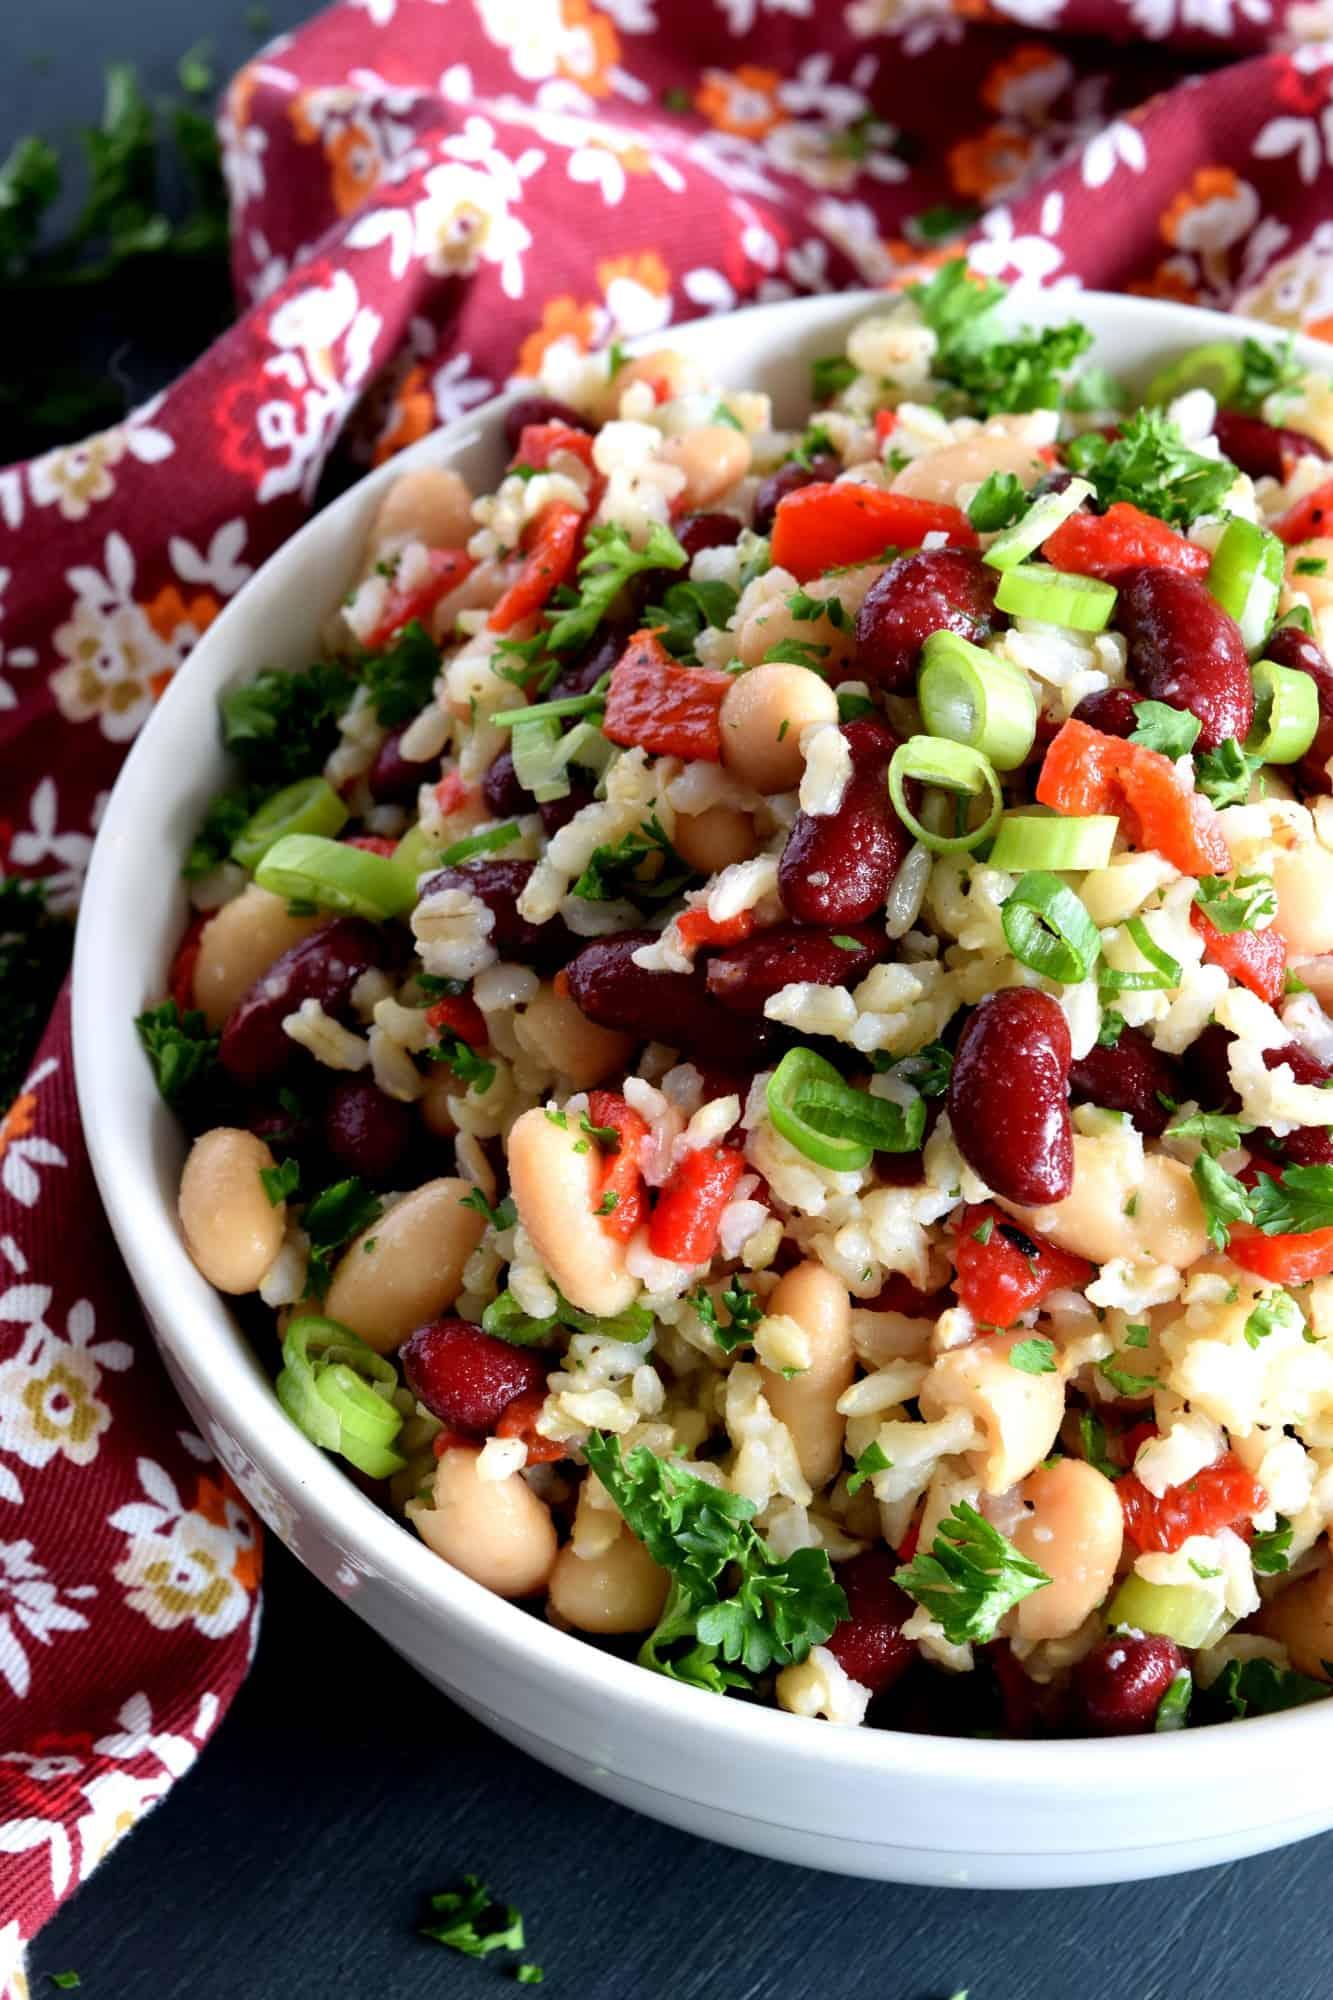 Kidney Bean Brown Rice Salad